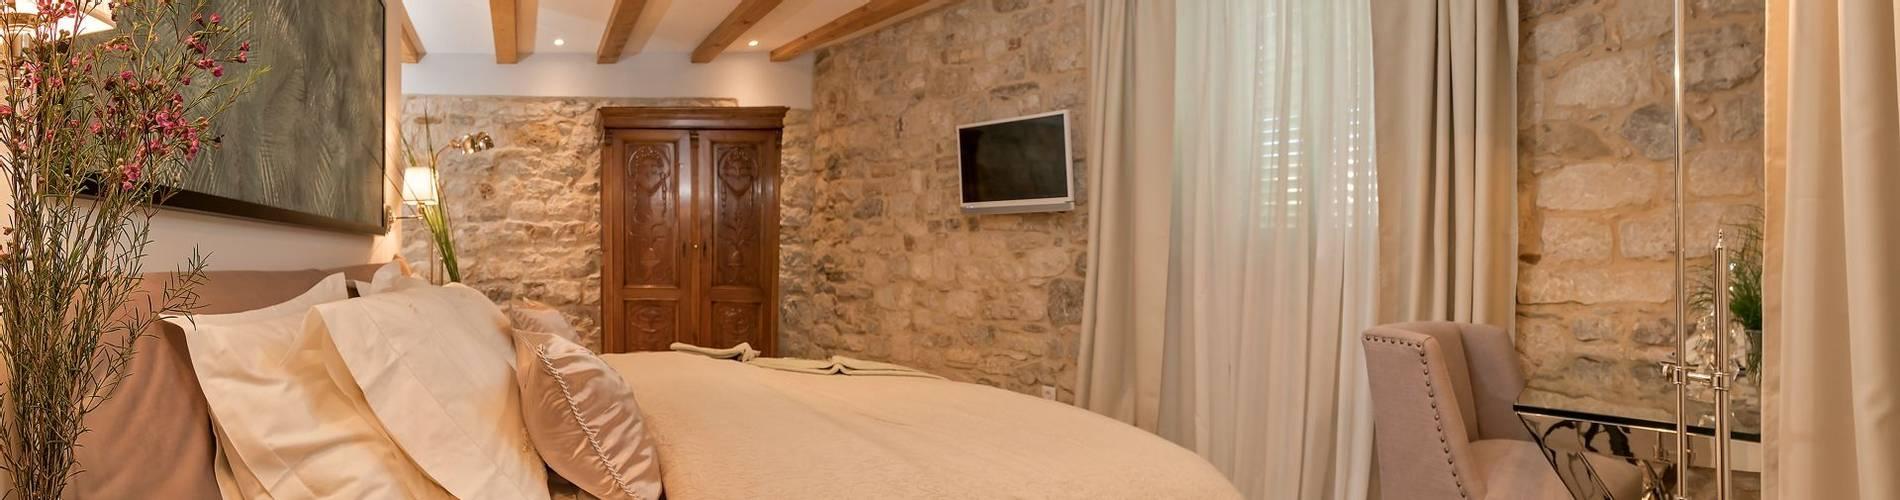 Heritage Hotel 19, Split, Croatia (20).jpg